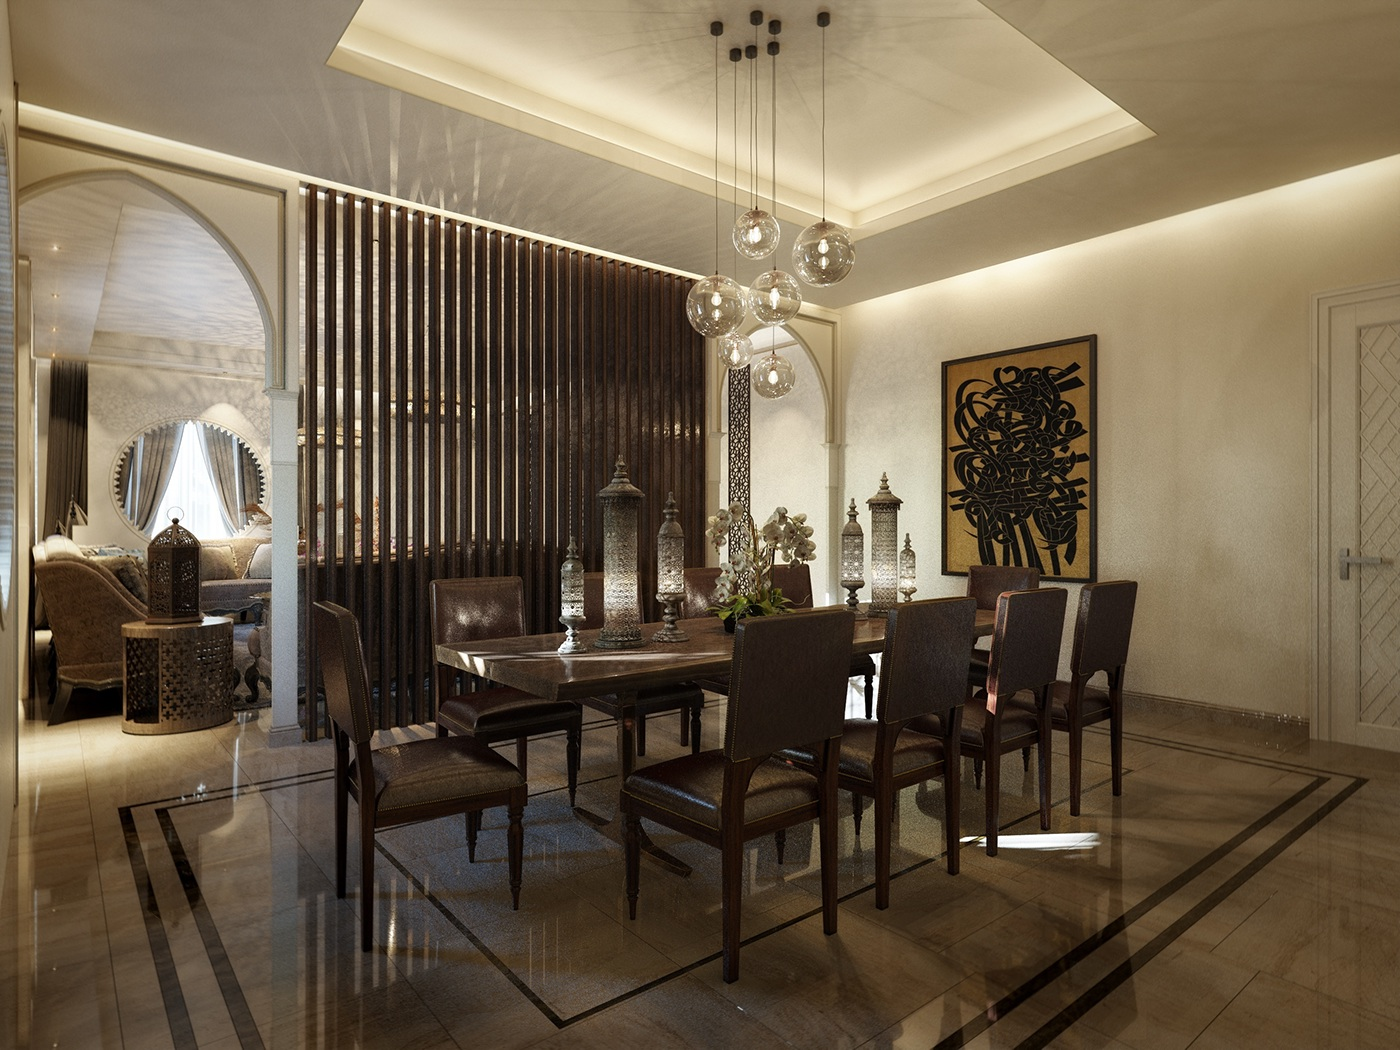 Private Villa Sharjah UAE FULL SET On Behance